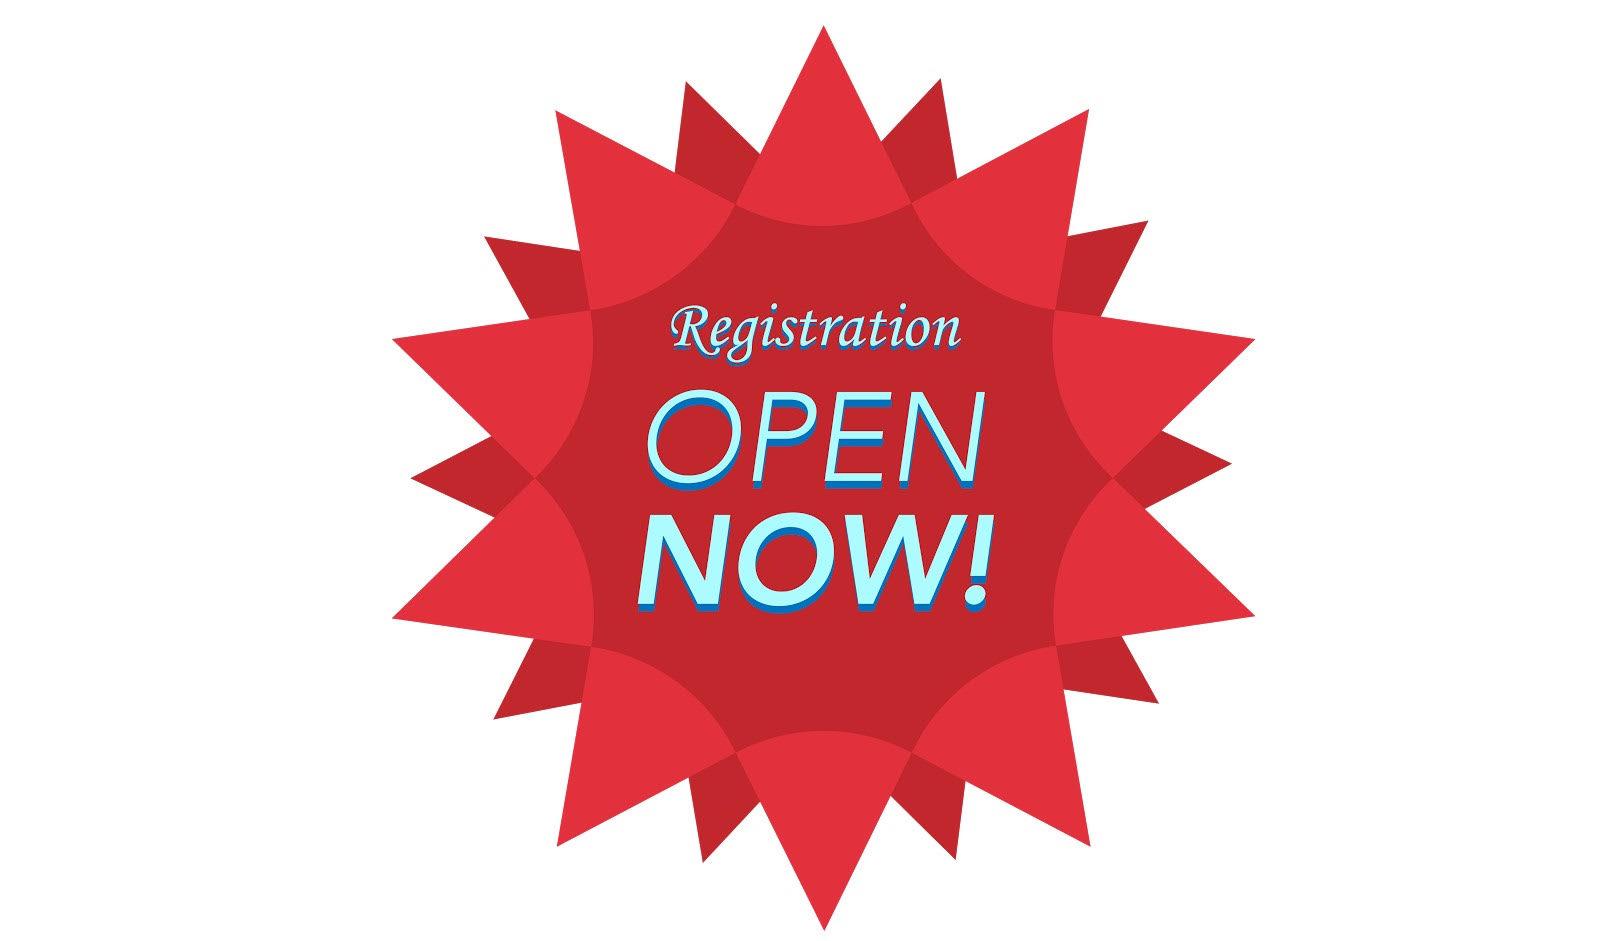 registration-open-image.jpg